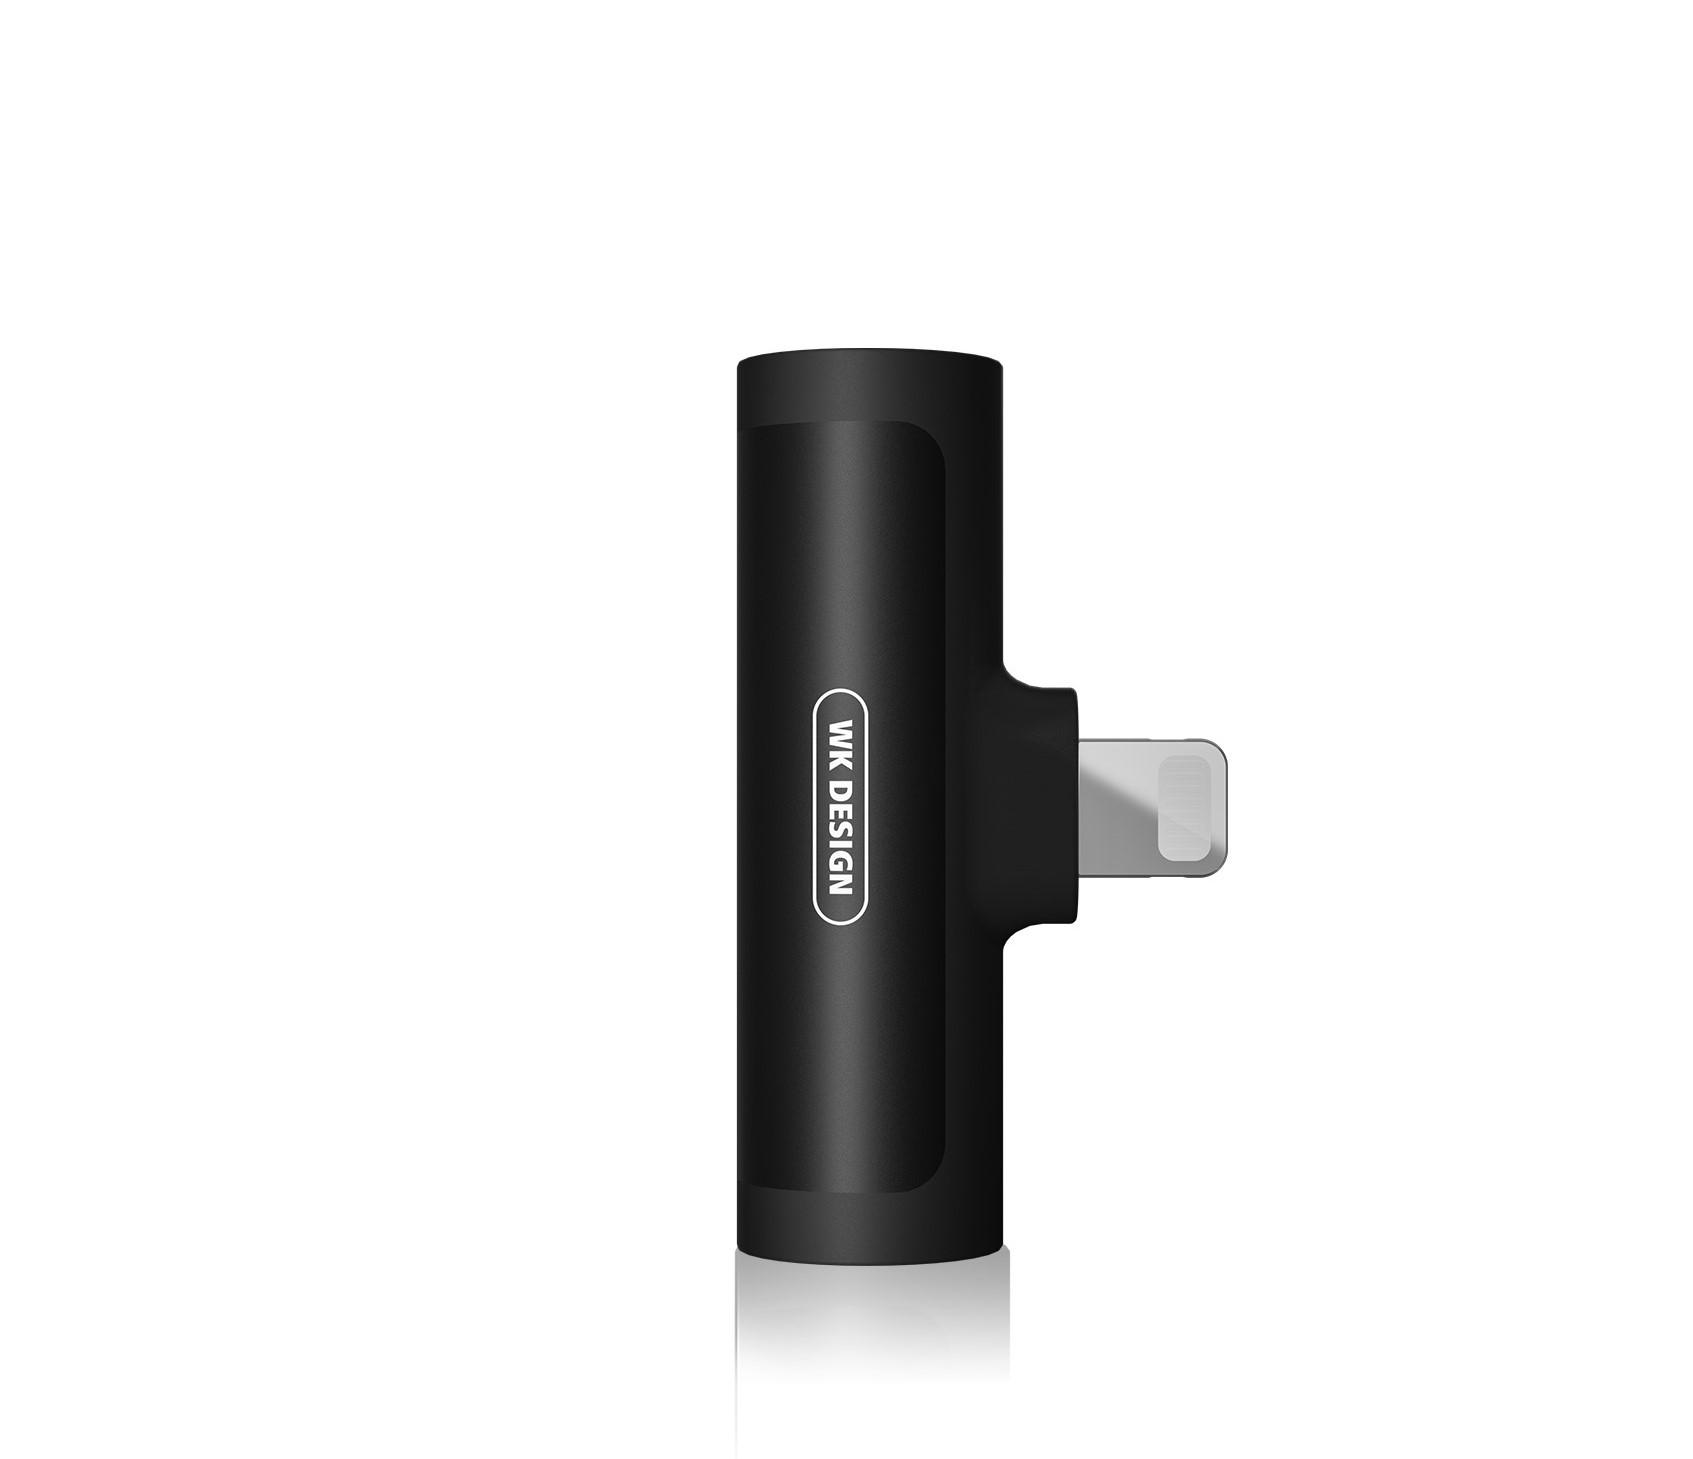 Adaptοr Lighting 2in1 Lighting & 3.5mm WDC-094i Black